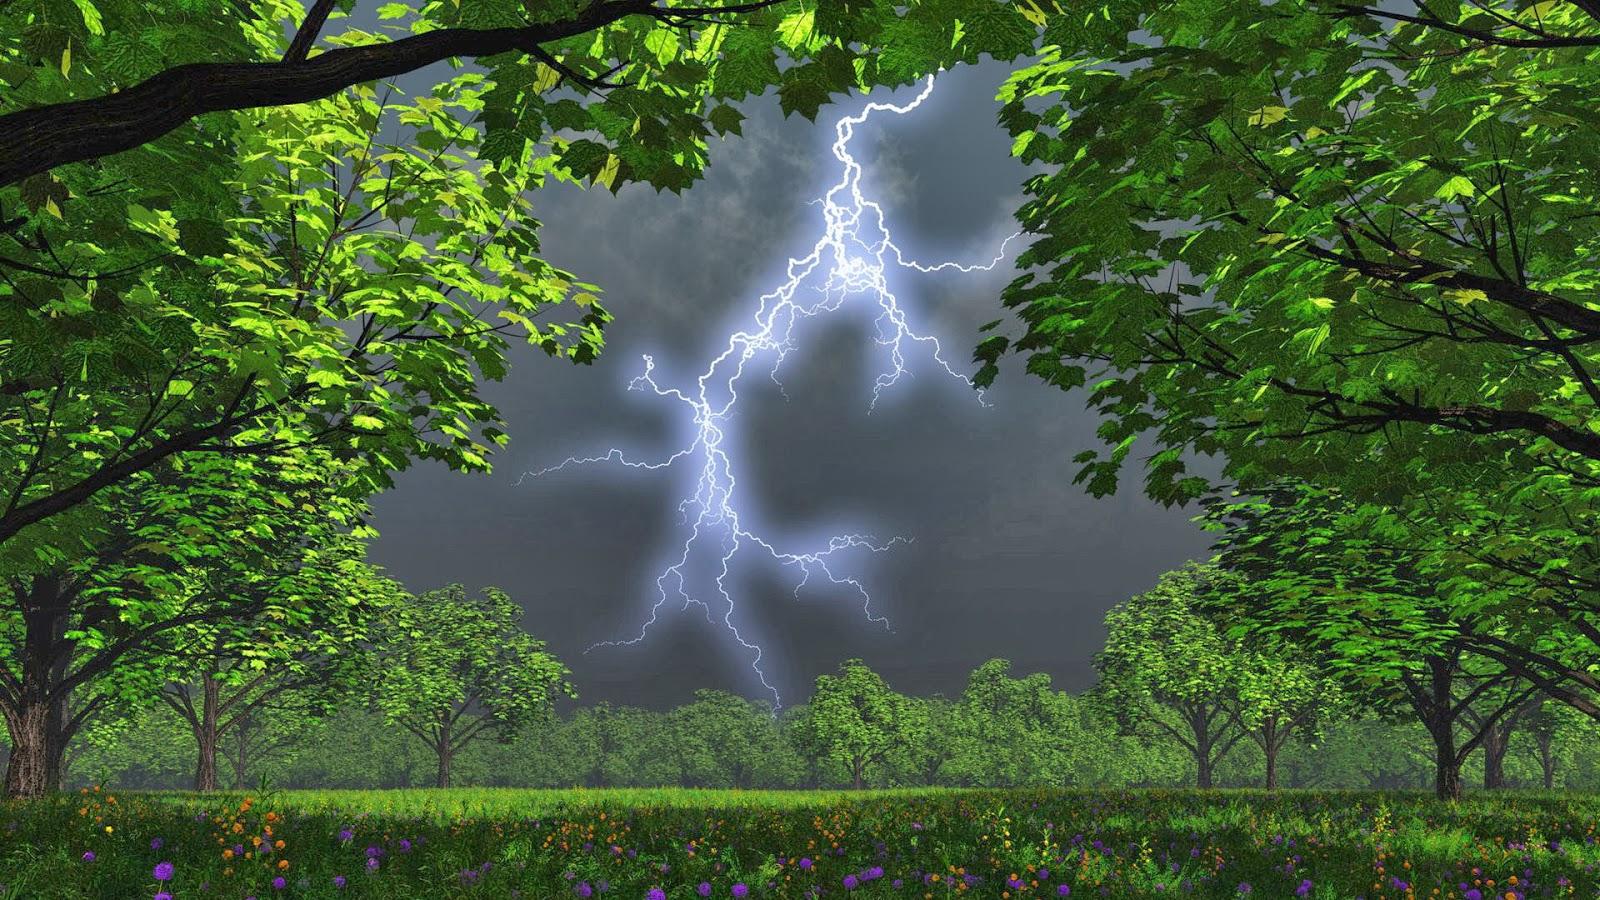 All 4u hd wallpaper free download natural wallpapers - Rainy nature hd wallpaper ...